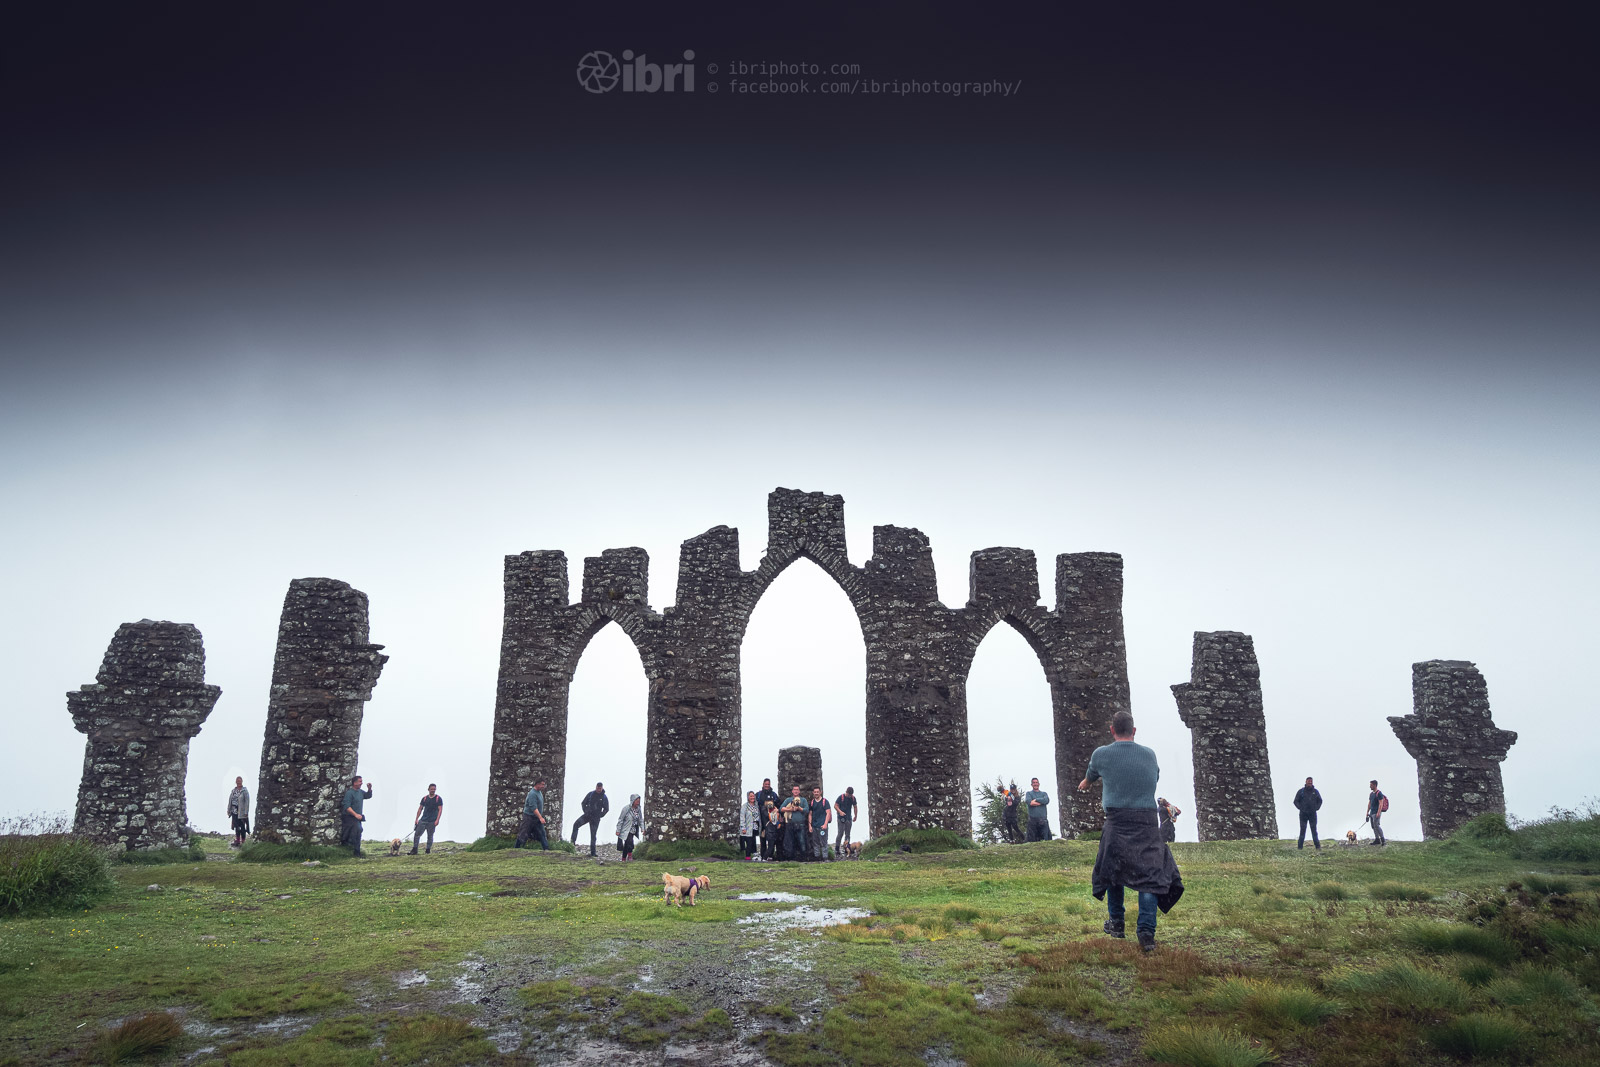 iBri Photography  •  Facebook  •  Instagram  •  Twitter